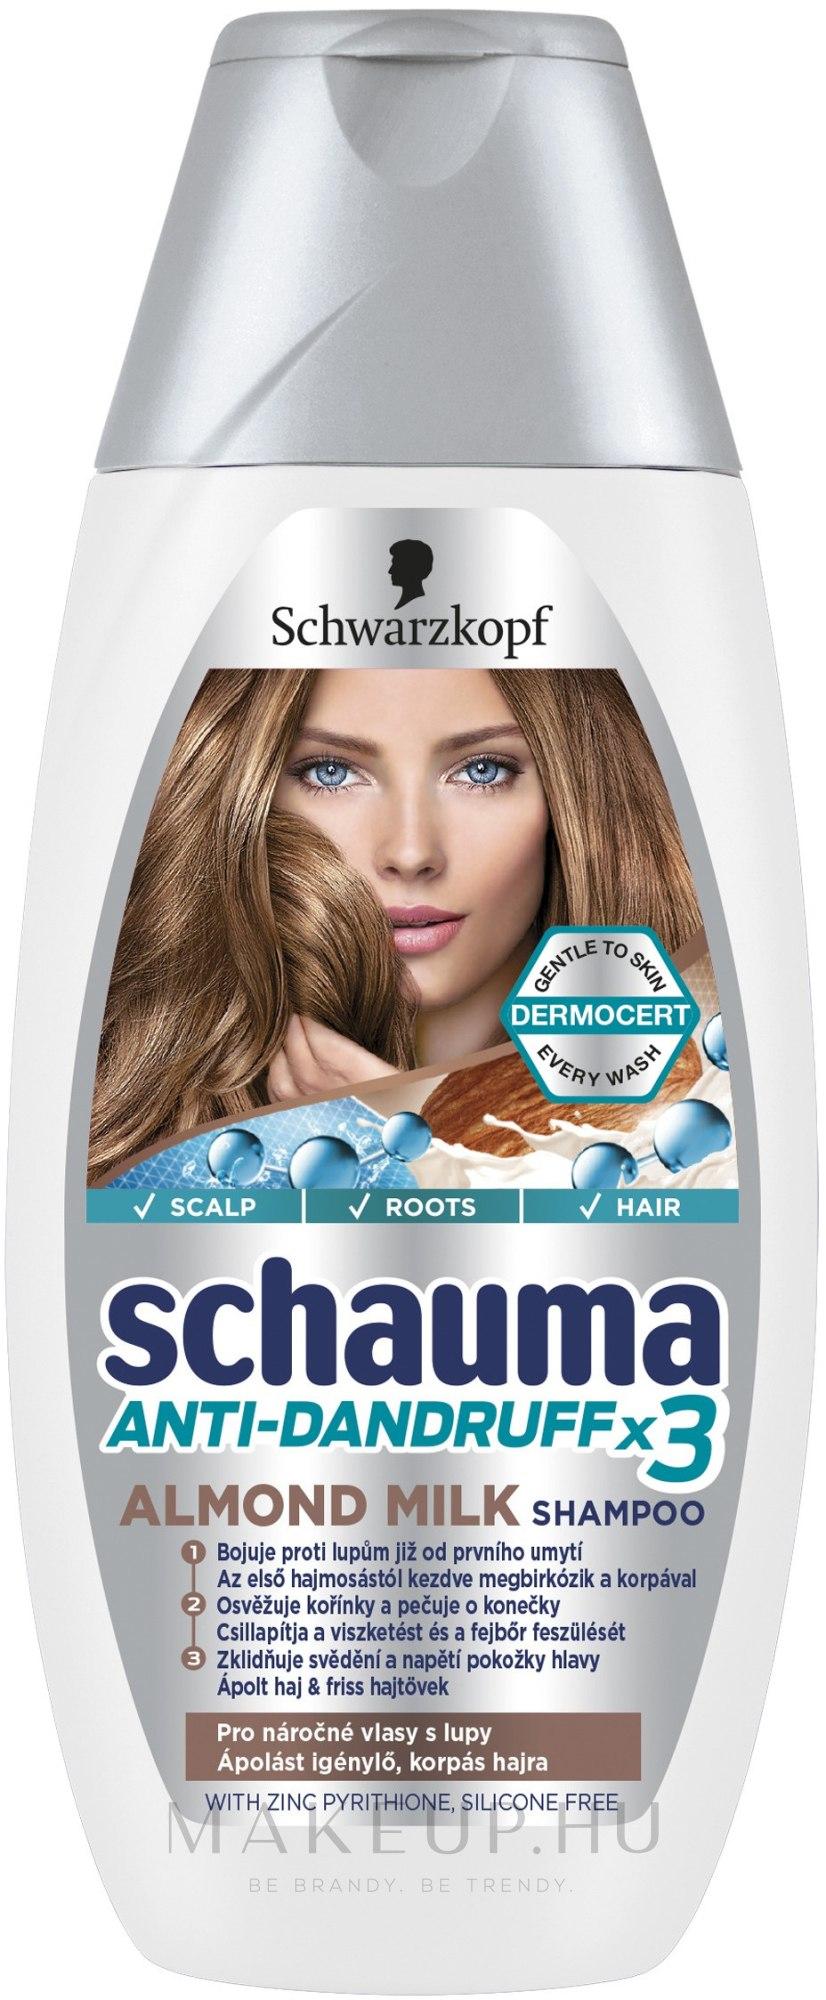 "Korpásodás elleni sampon ""Mandula tej"" - Schwarzkopf Schauma Anti-Dandruff x3 Almond Milk — fotó 400 ml"